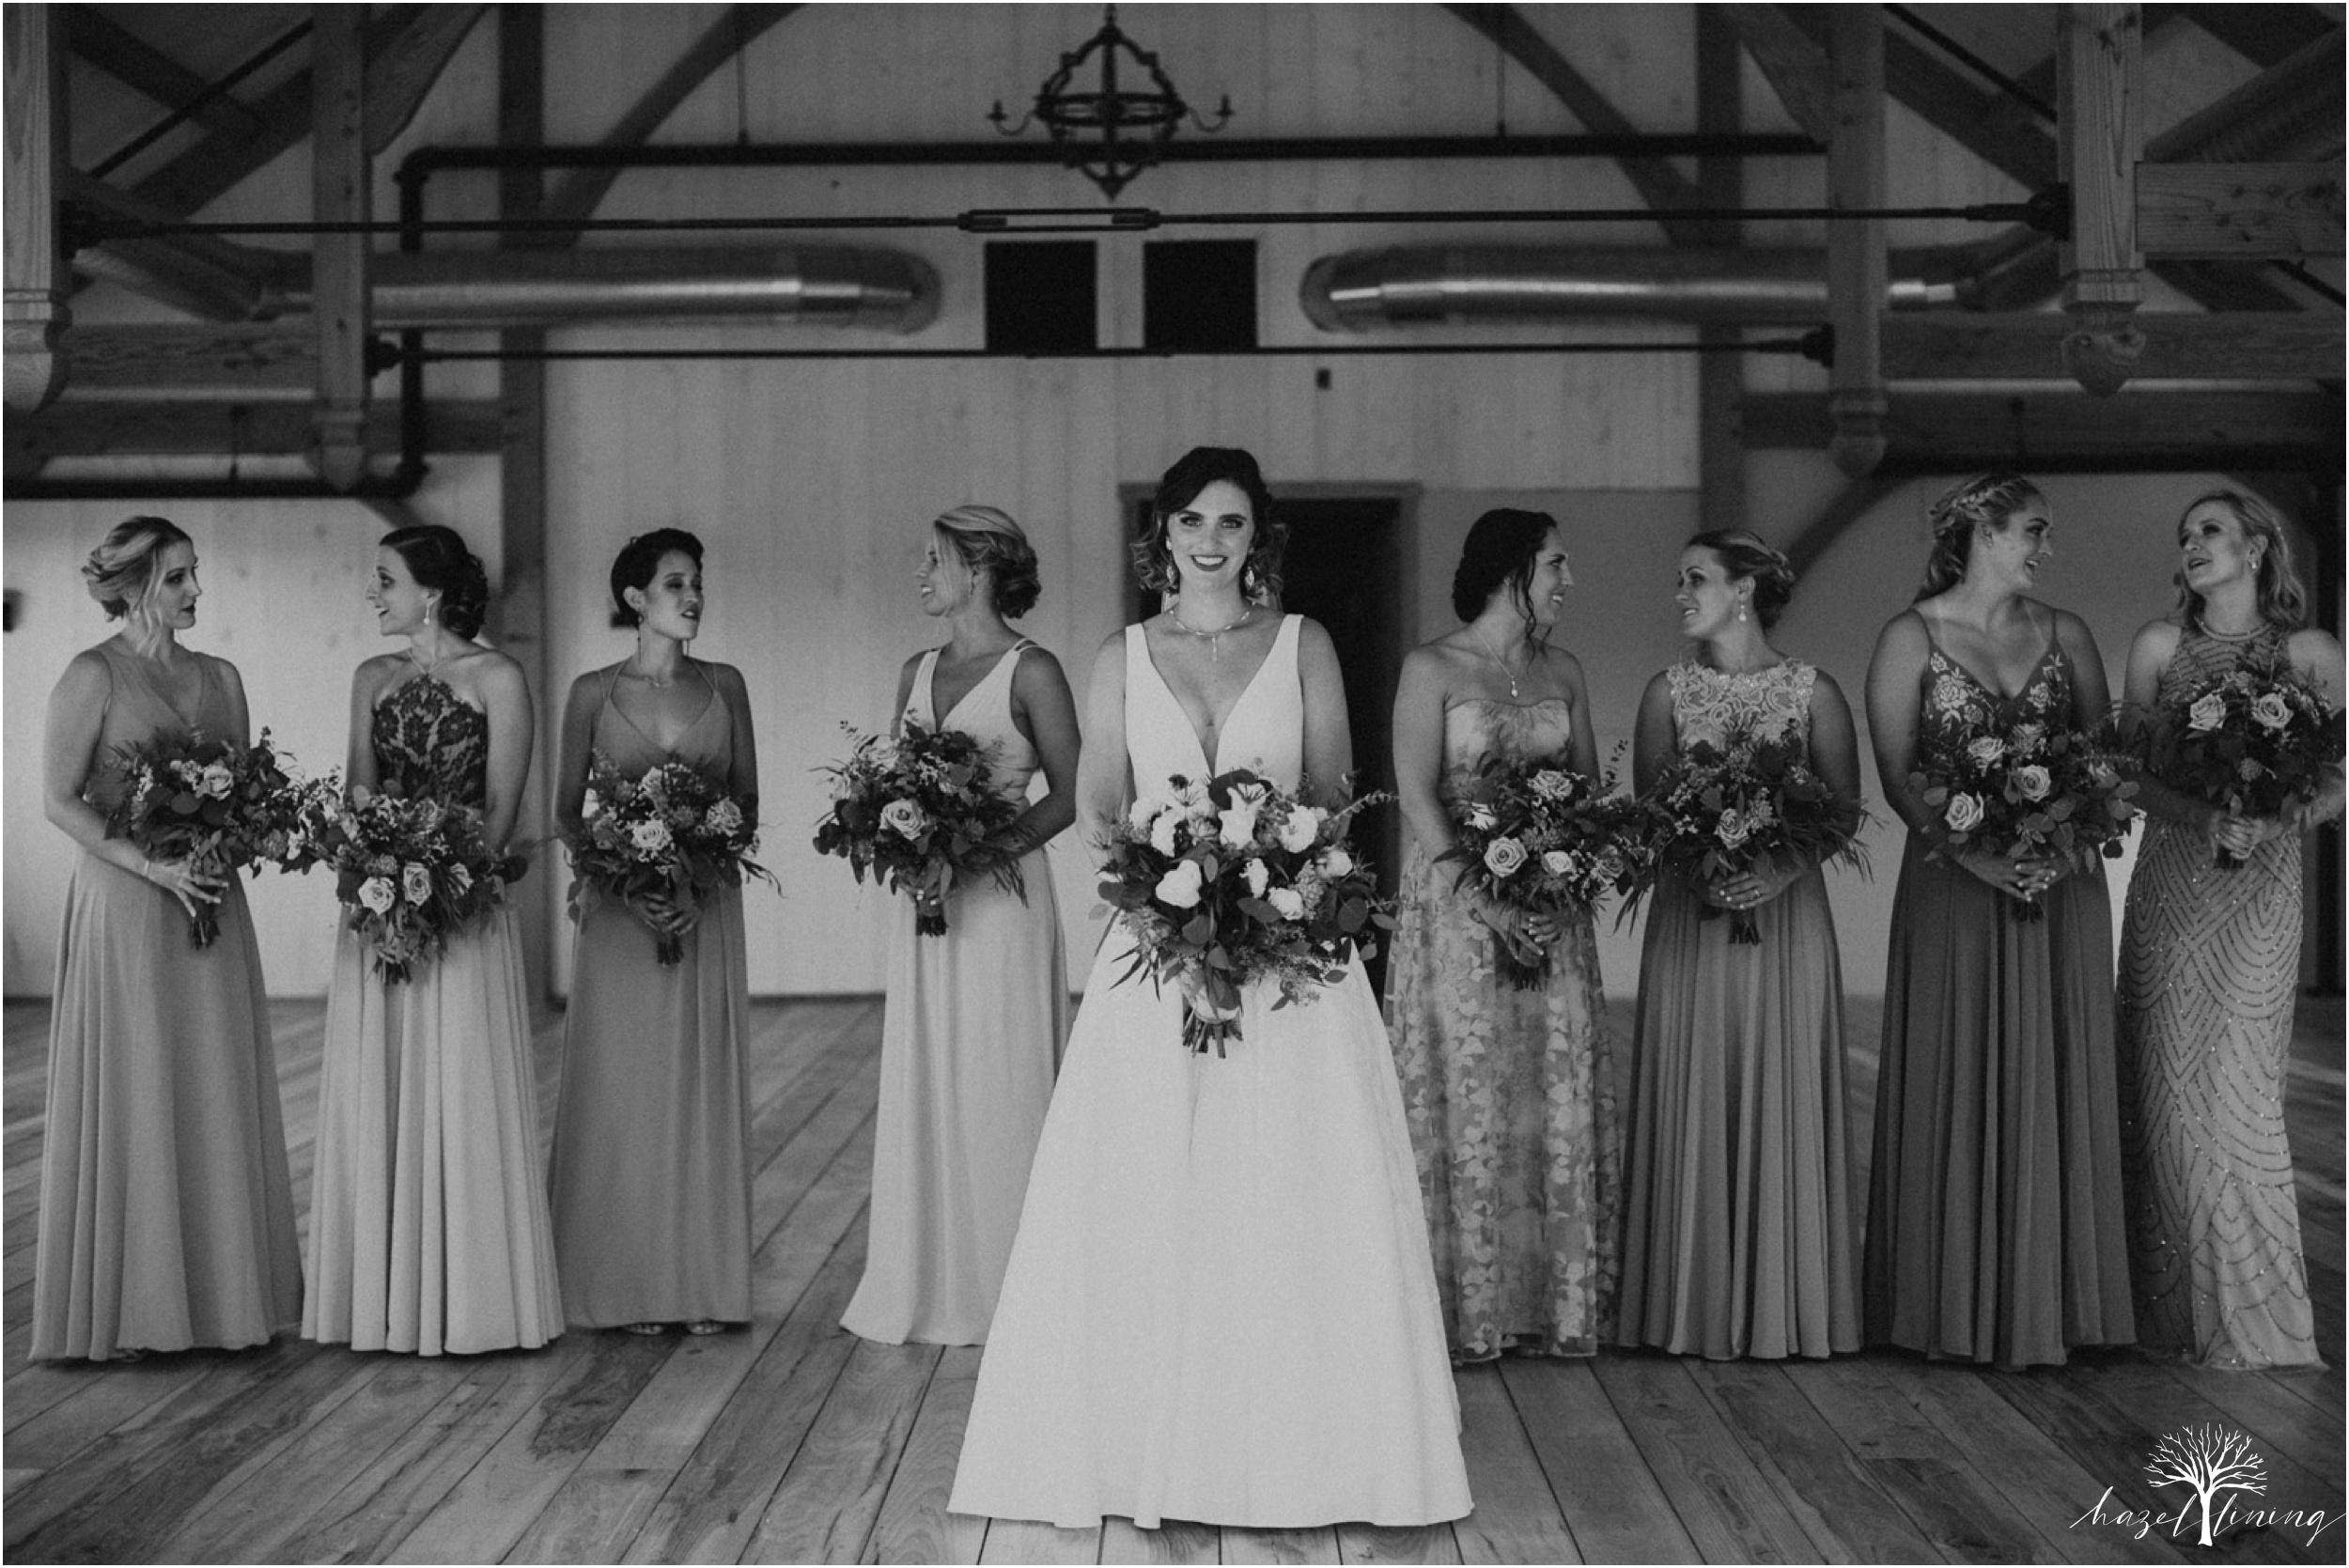 maureen-hepner-anthony-giordano-rose-bank-winery-newtow-pennsylvania-luxury-summer-wedding-hazel-lining-photography-destination-elopement-wedding-engagement-photography_0029.jpg